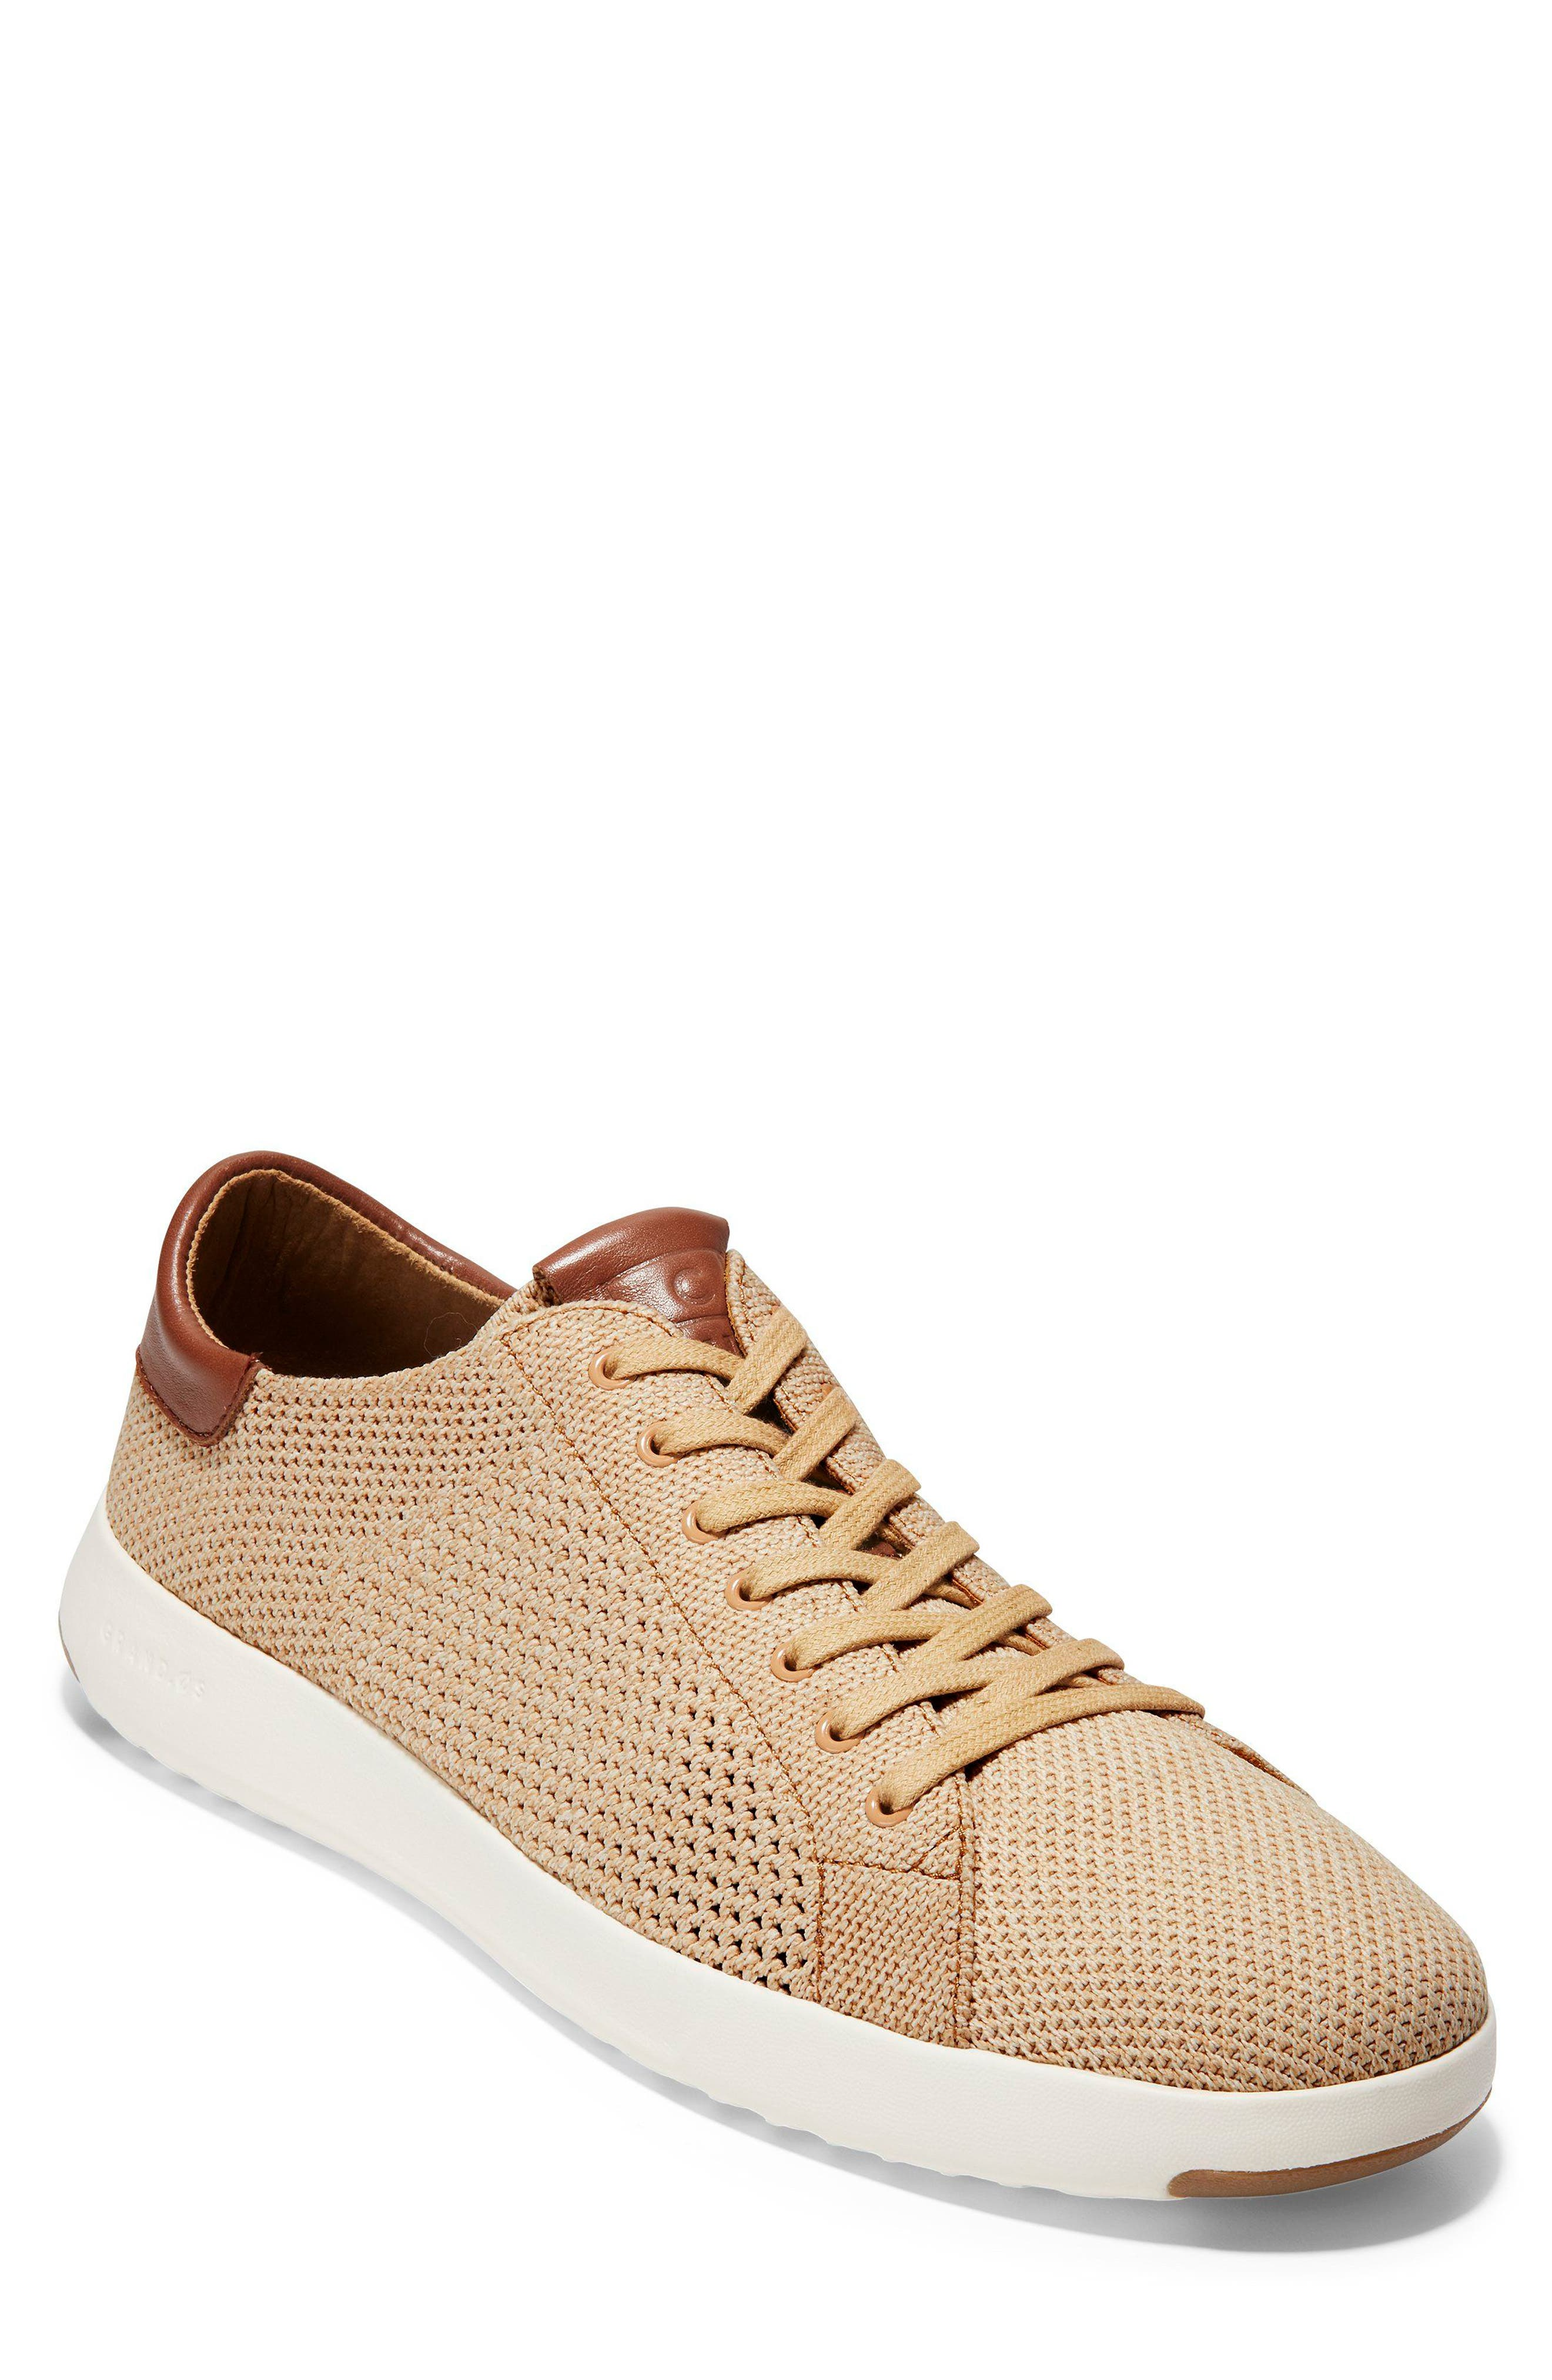 GrandPro Tennis Stitchlite Sneaker,                             Main thumbnail 5, color,